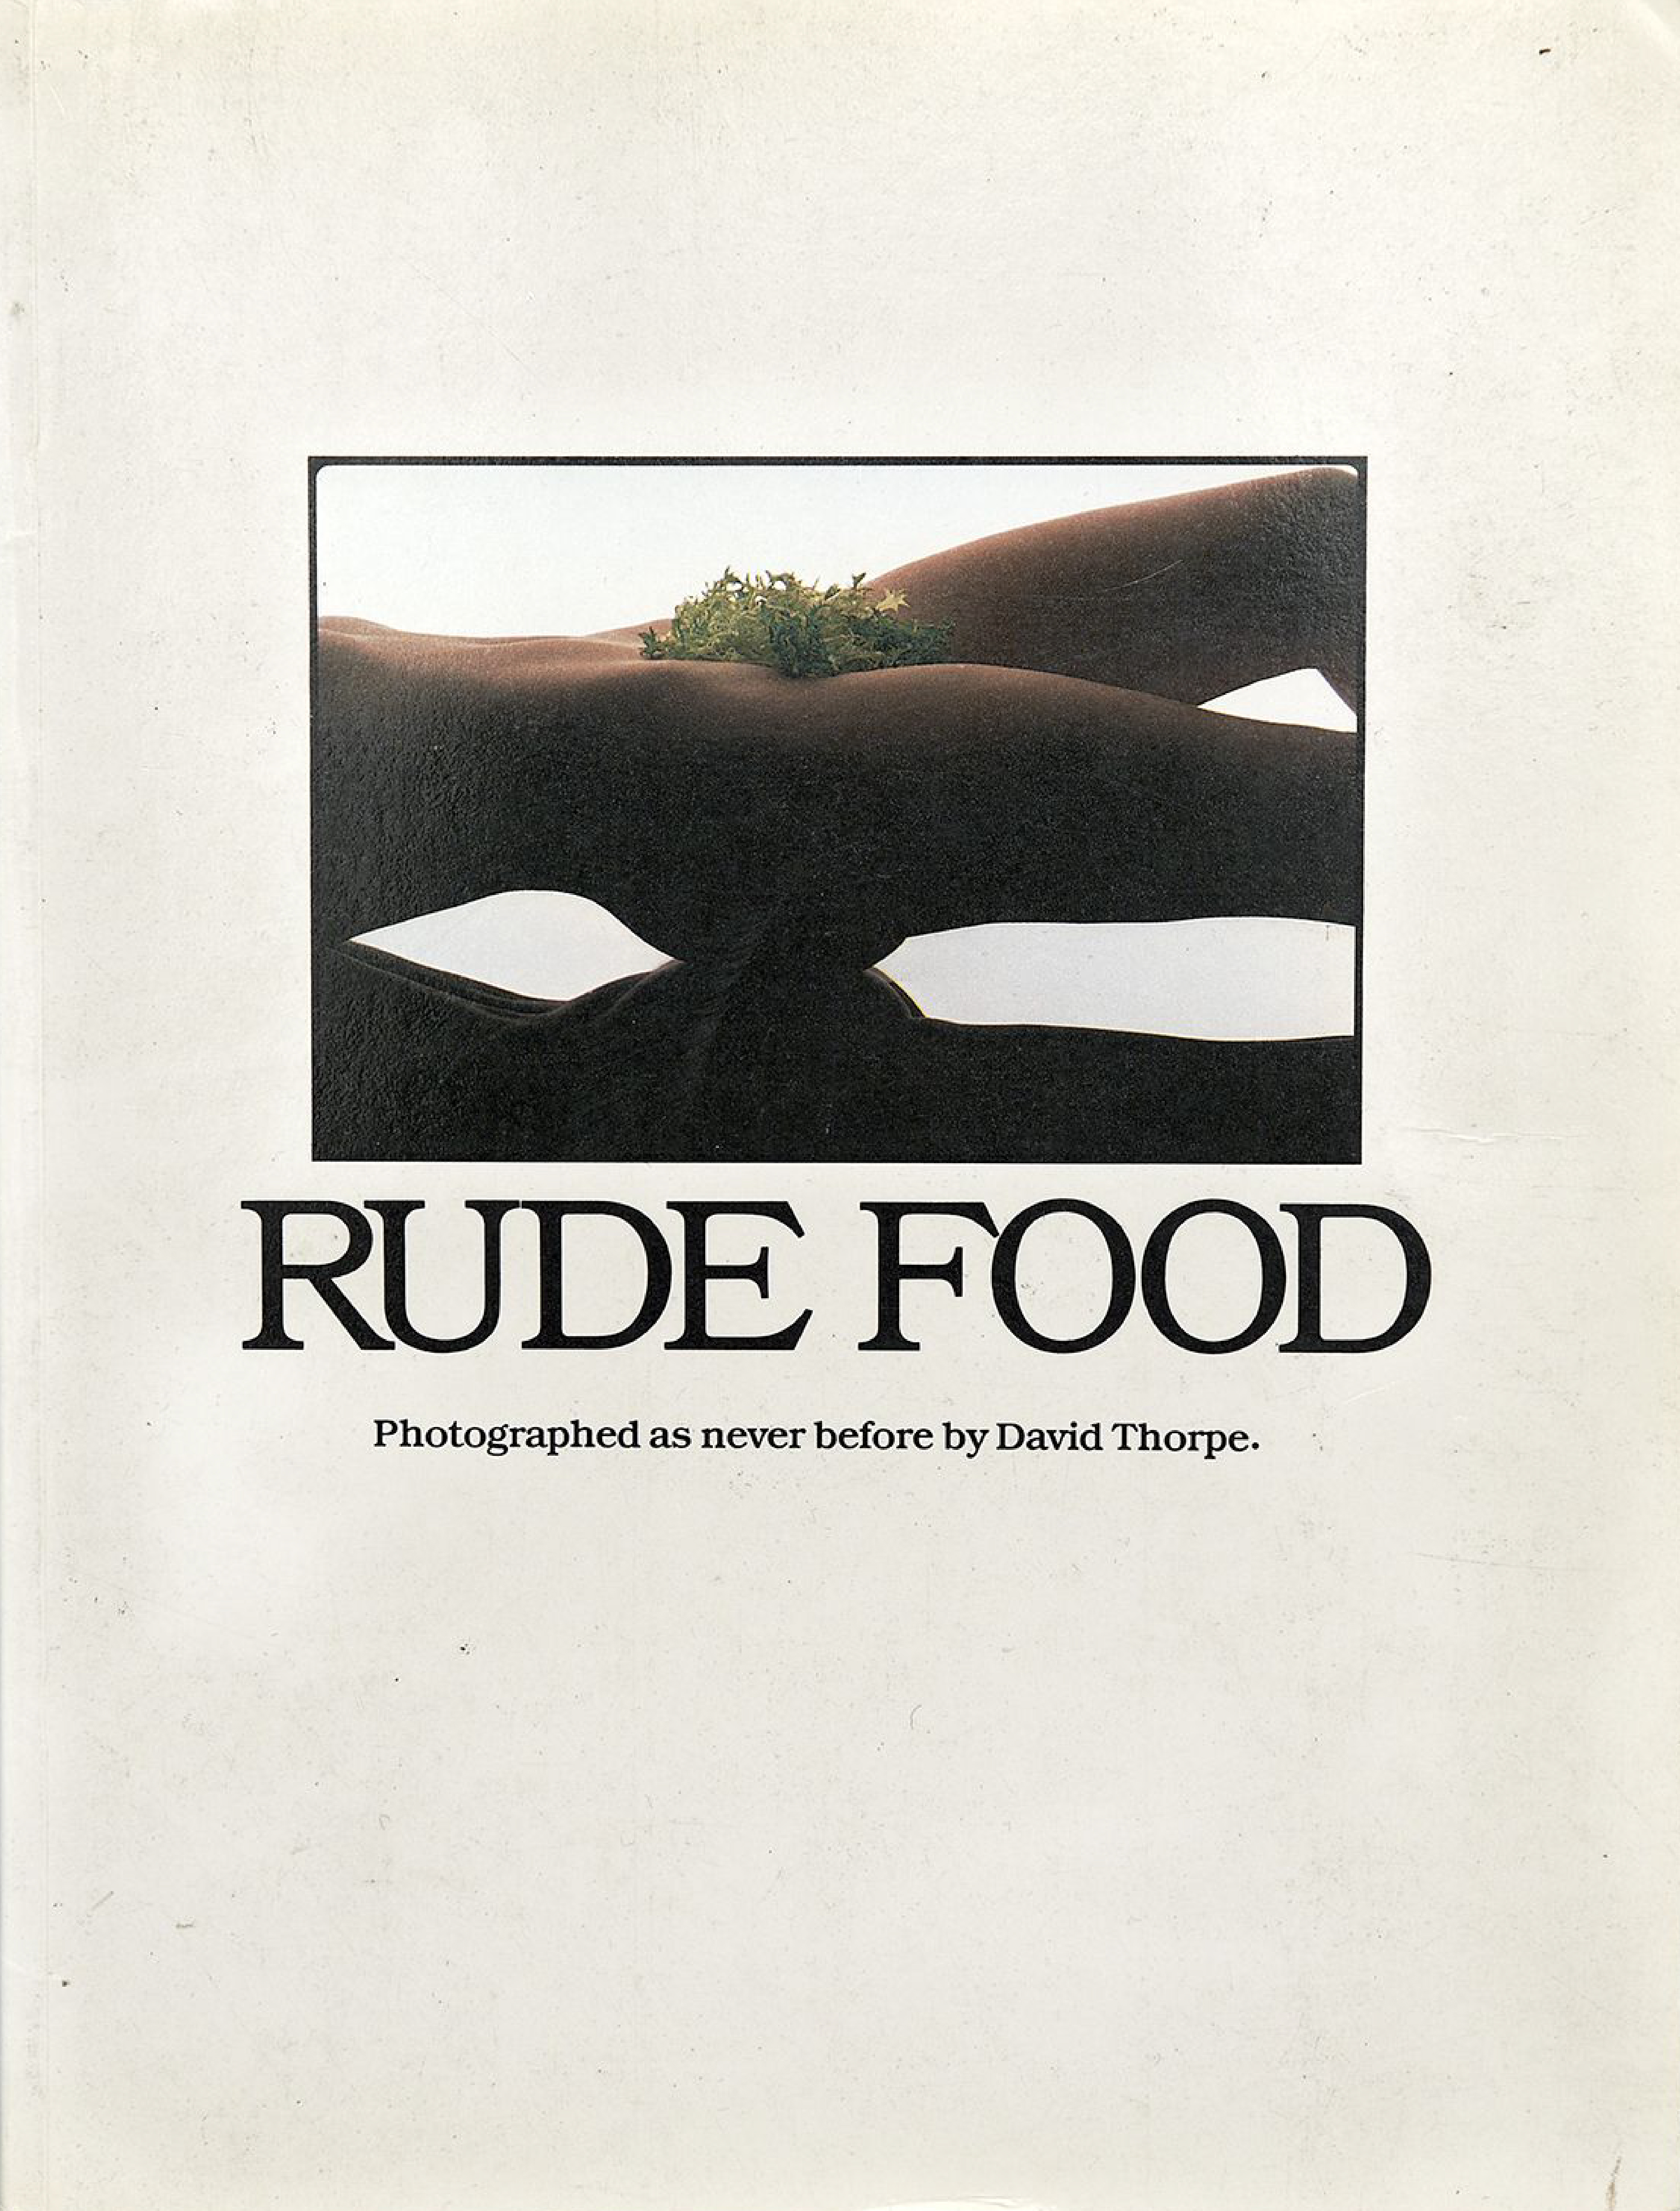 David Thorpe 'Rude Food' Book-01